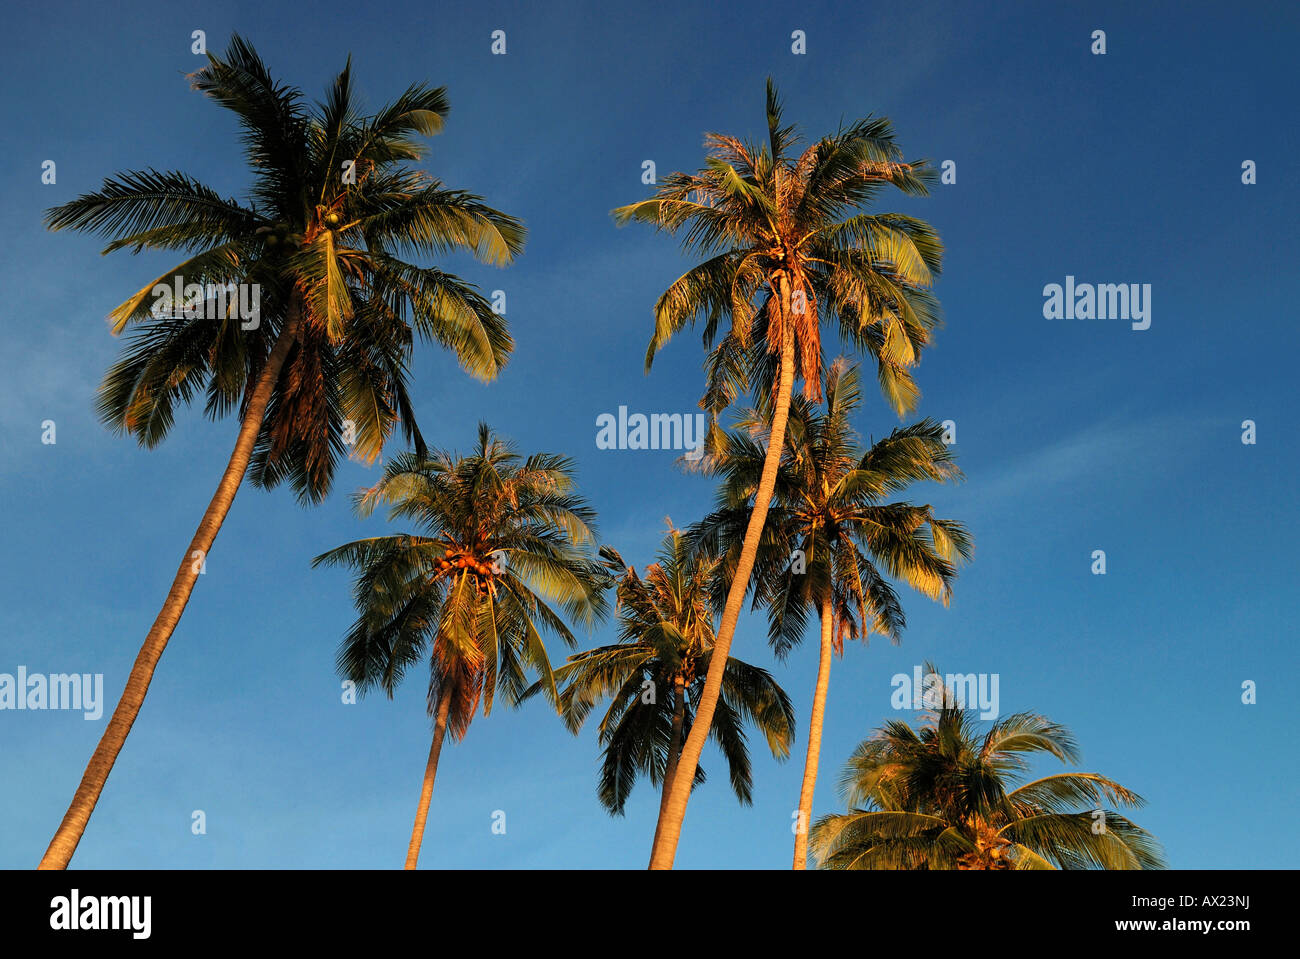 Palm trees in evening light, island Kho Phangan, Thailand - Stock Image